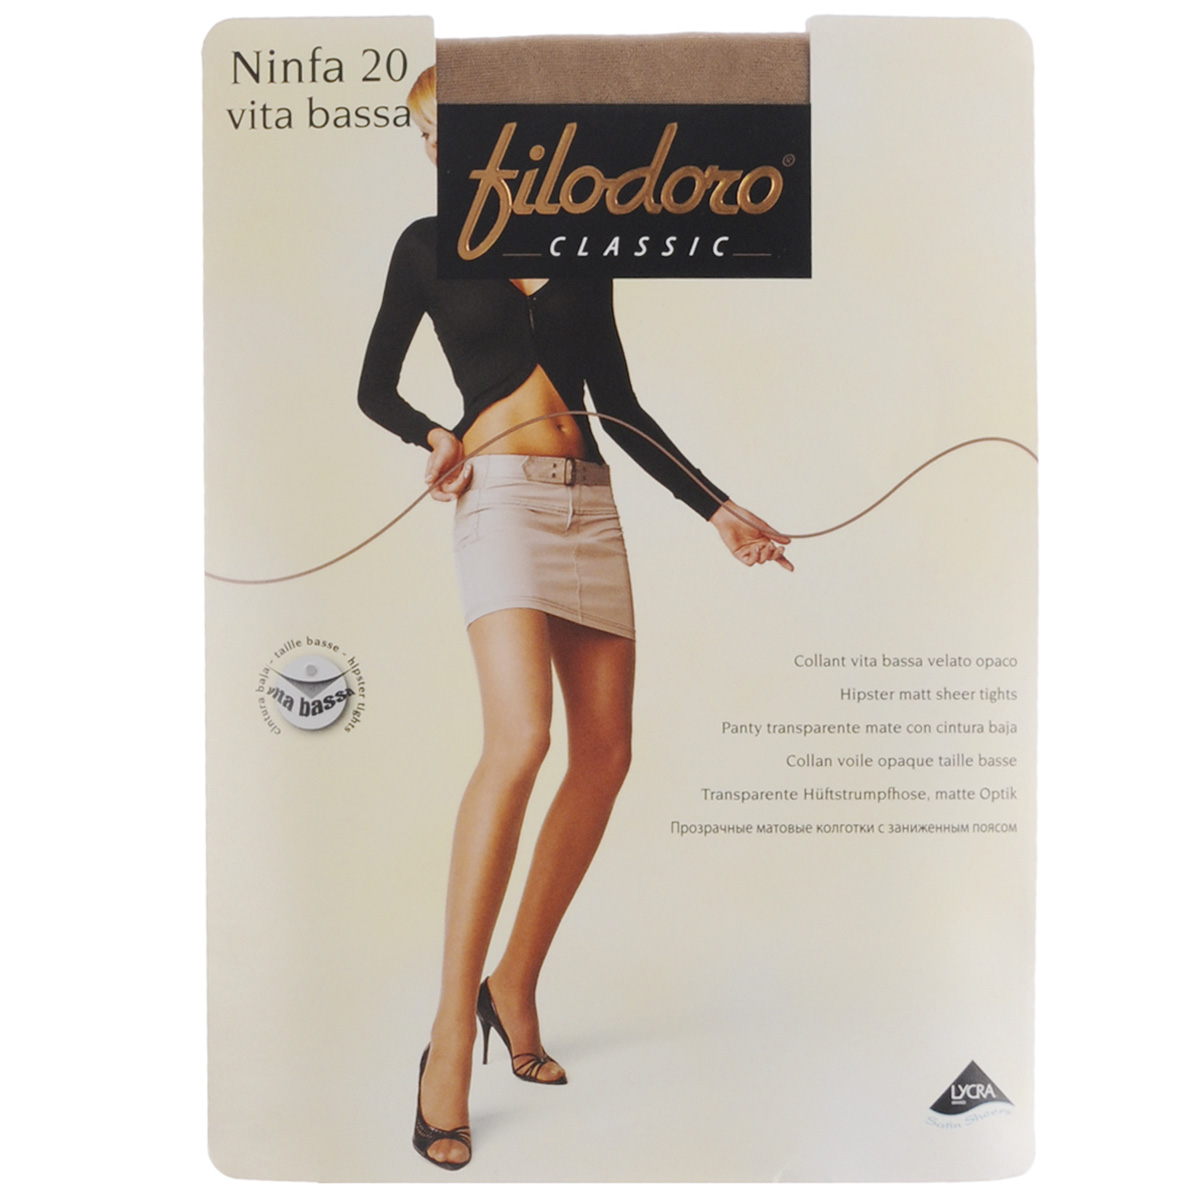 Колготки женские Filodoro Classic Ninfa 20 Vita Bassa, цвет: Tea (легкий загар). C112822FC. Размер 2 (S) колготки женские filodoro classic ninfa 20 цвет nero черный c109172fc размер 2 s